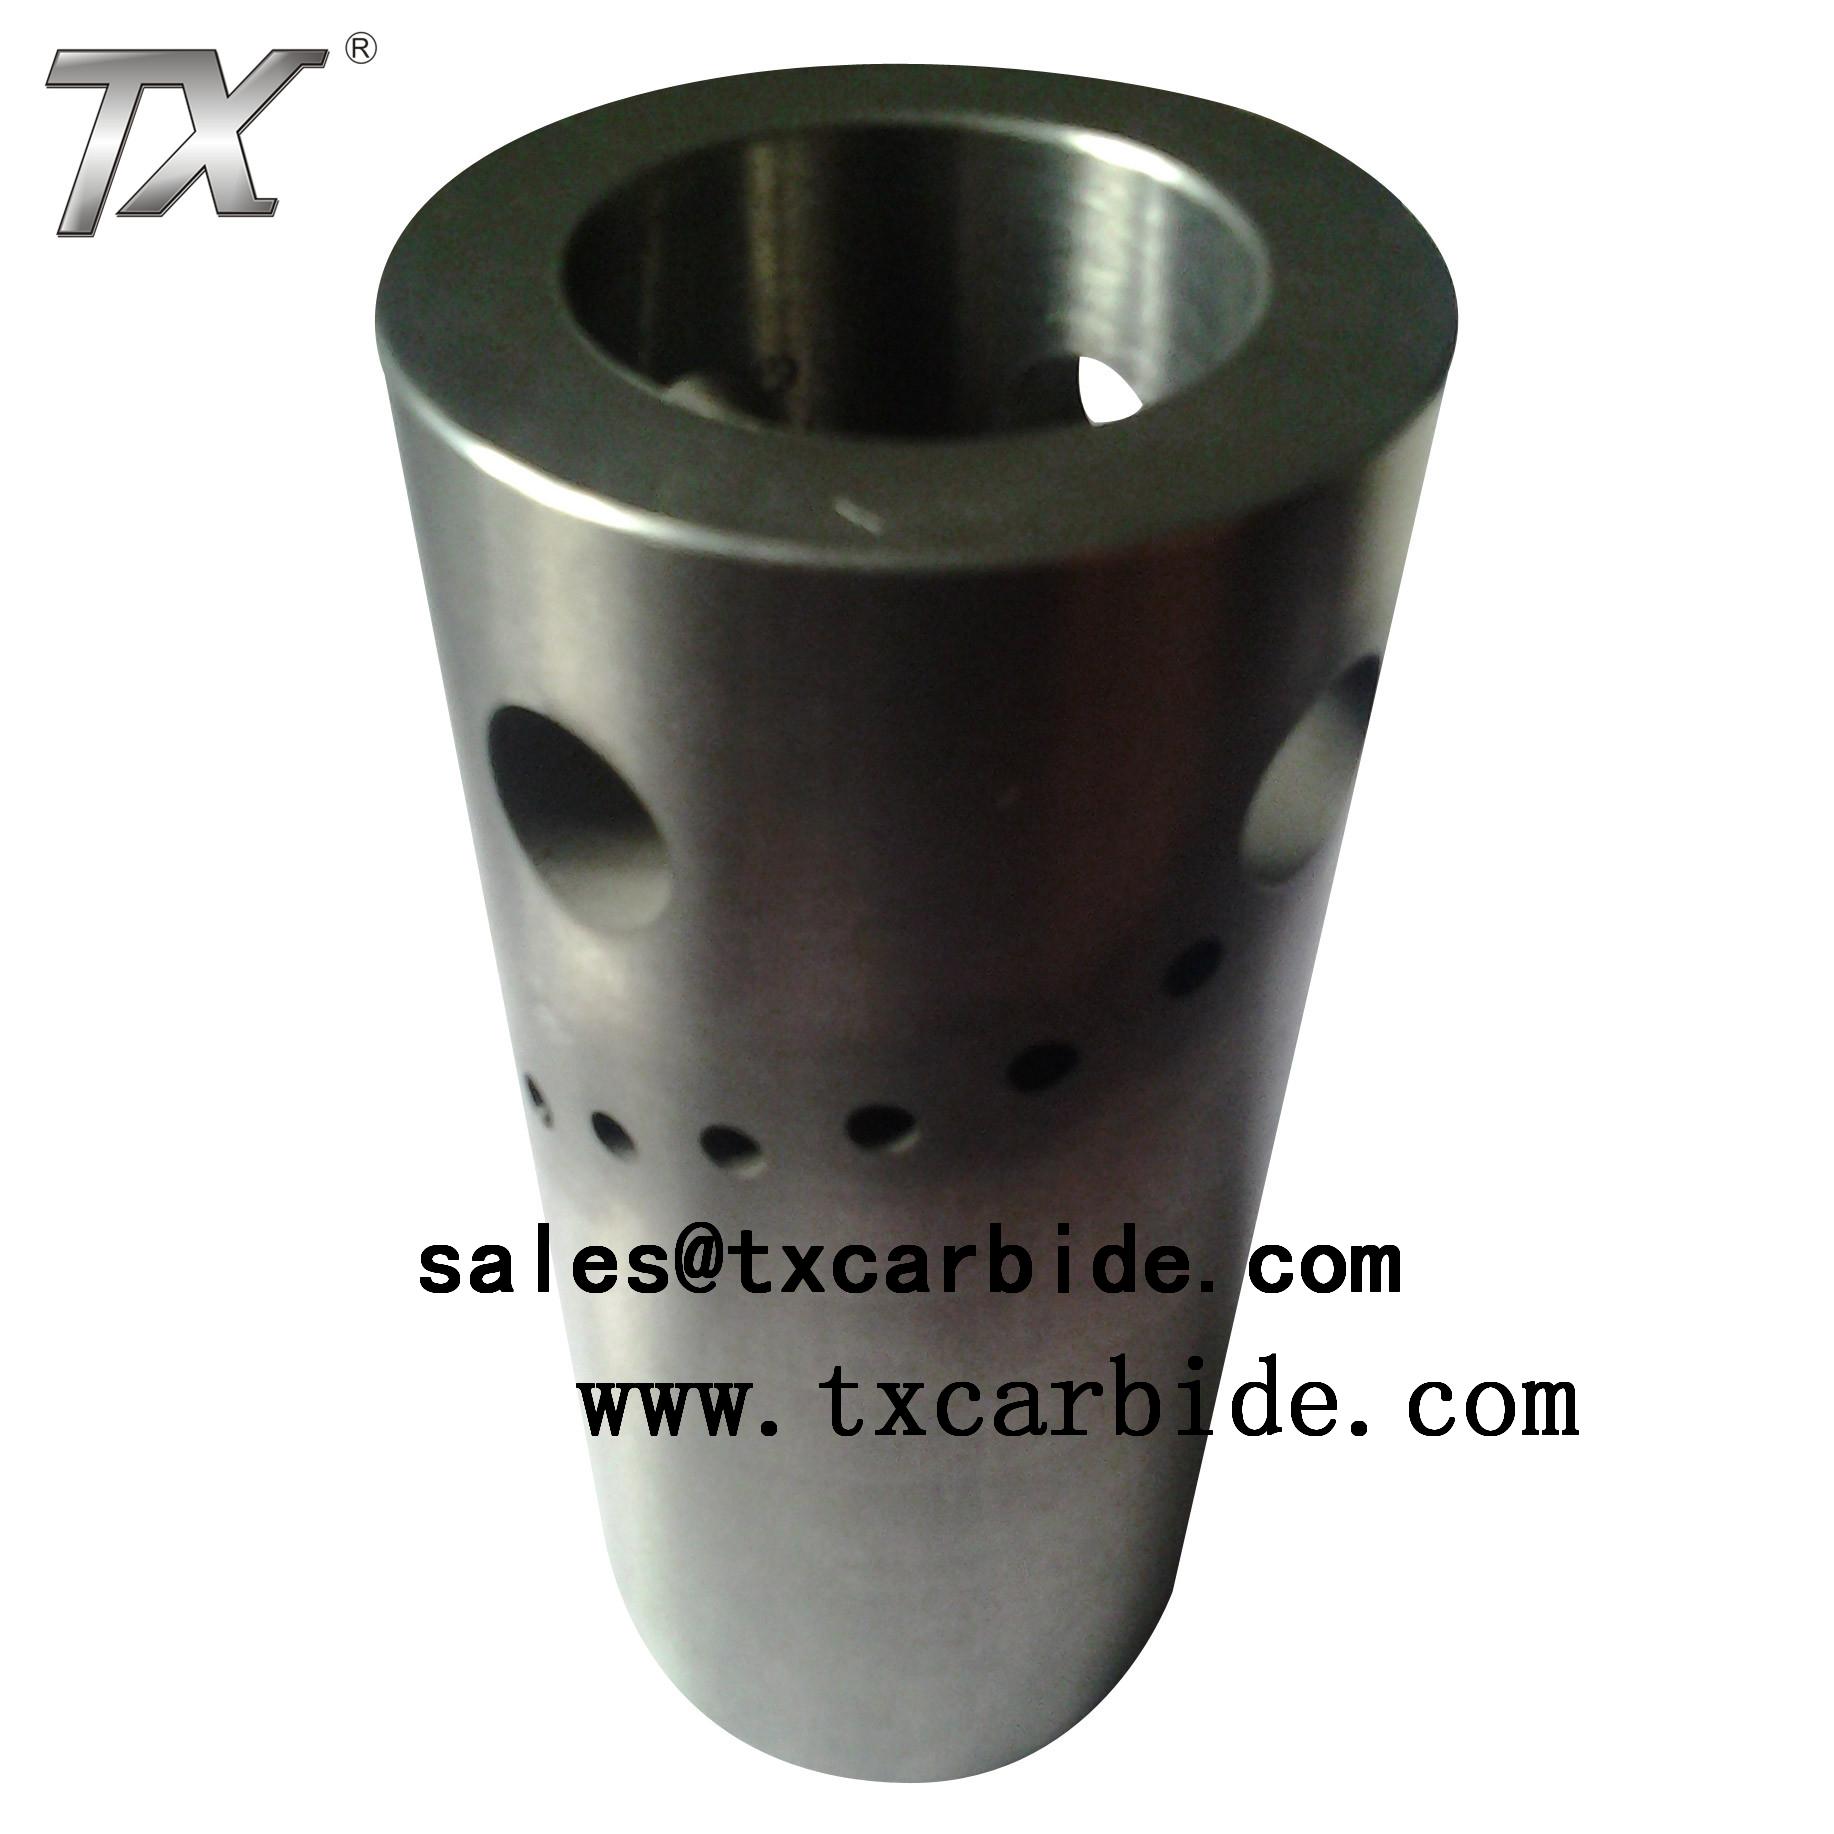 Tungsten Carbide Downhole Drilling Bushings